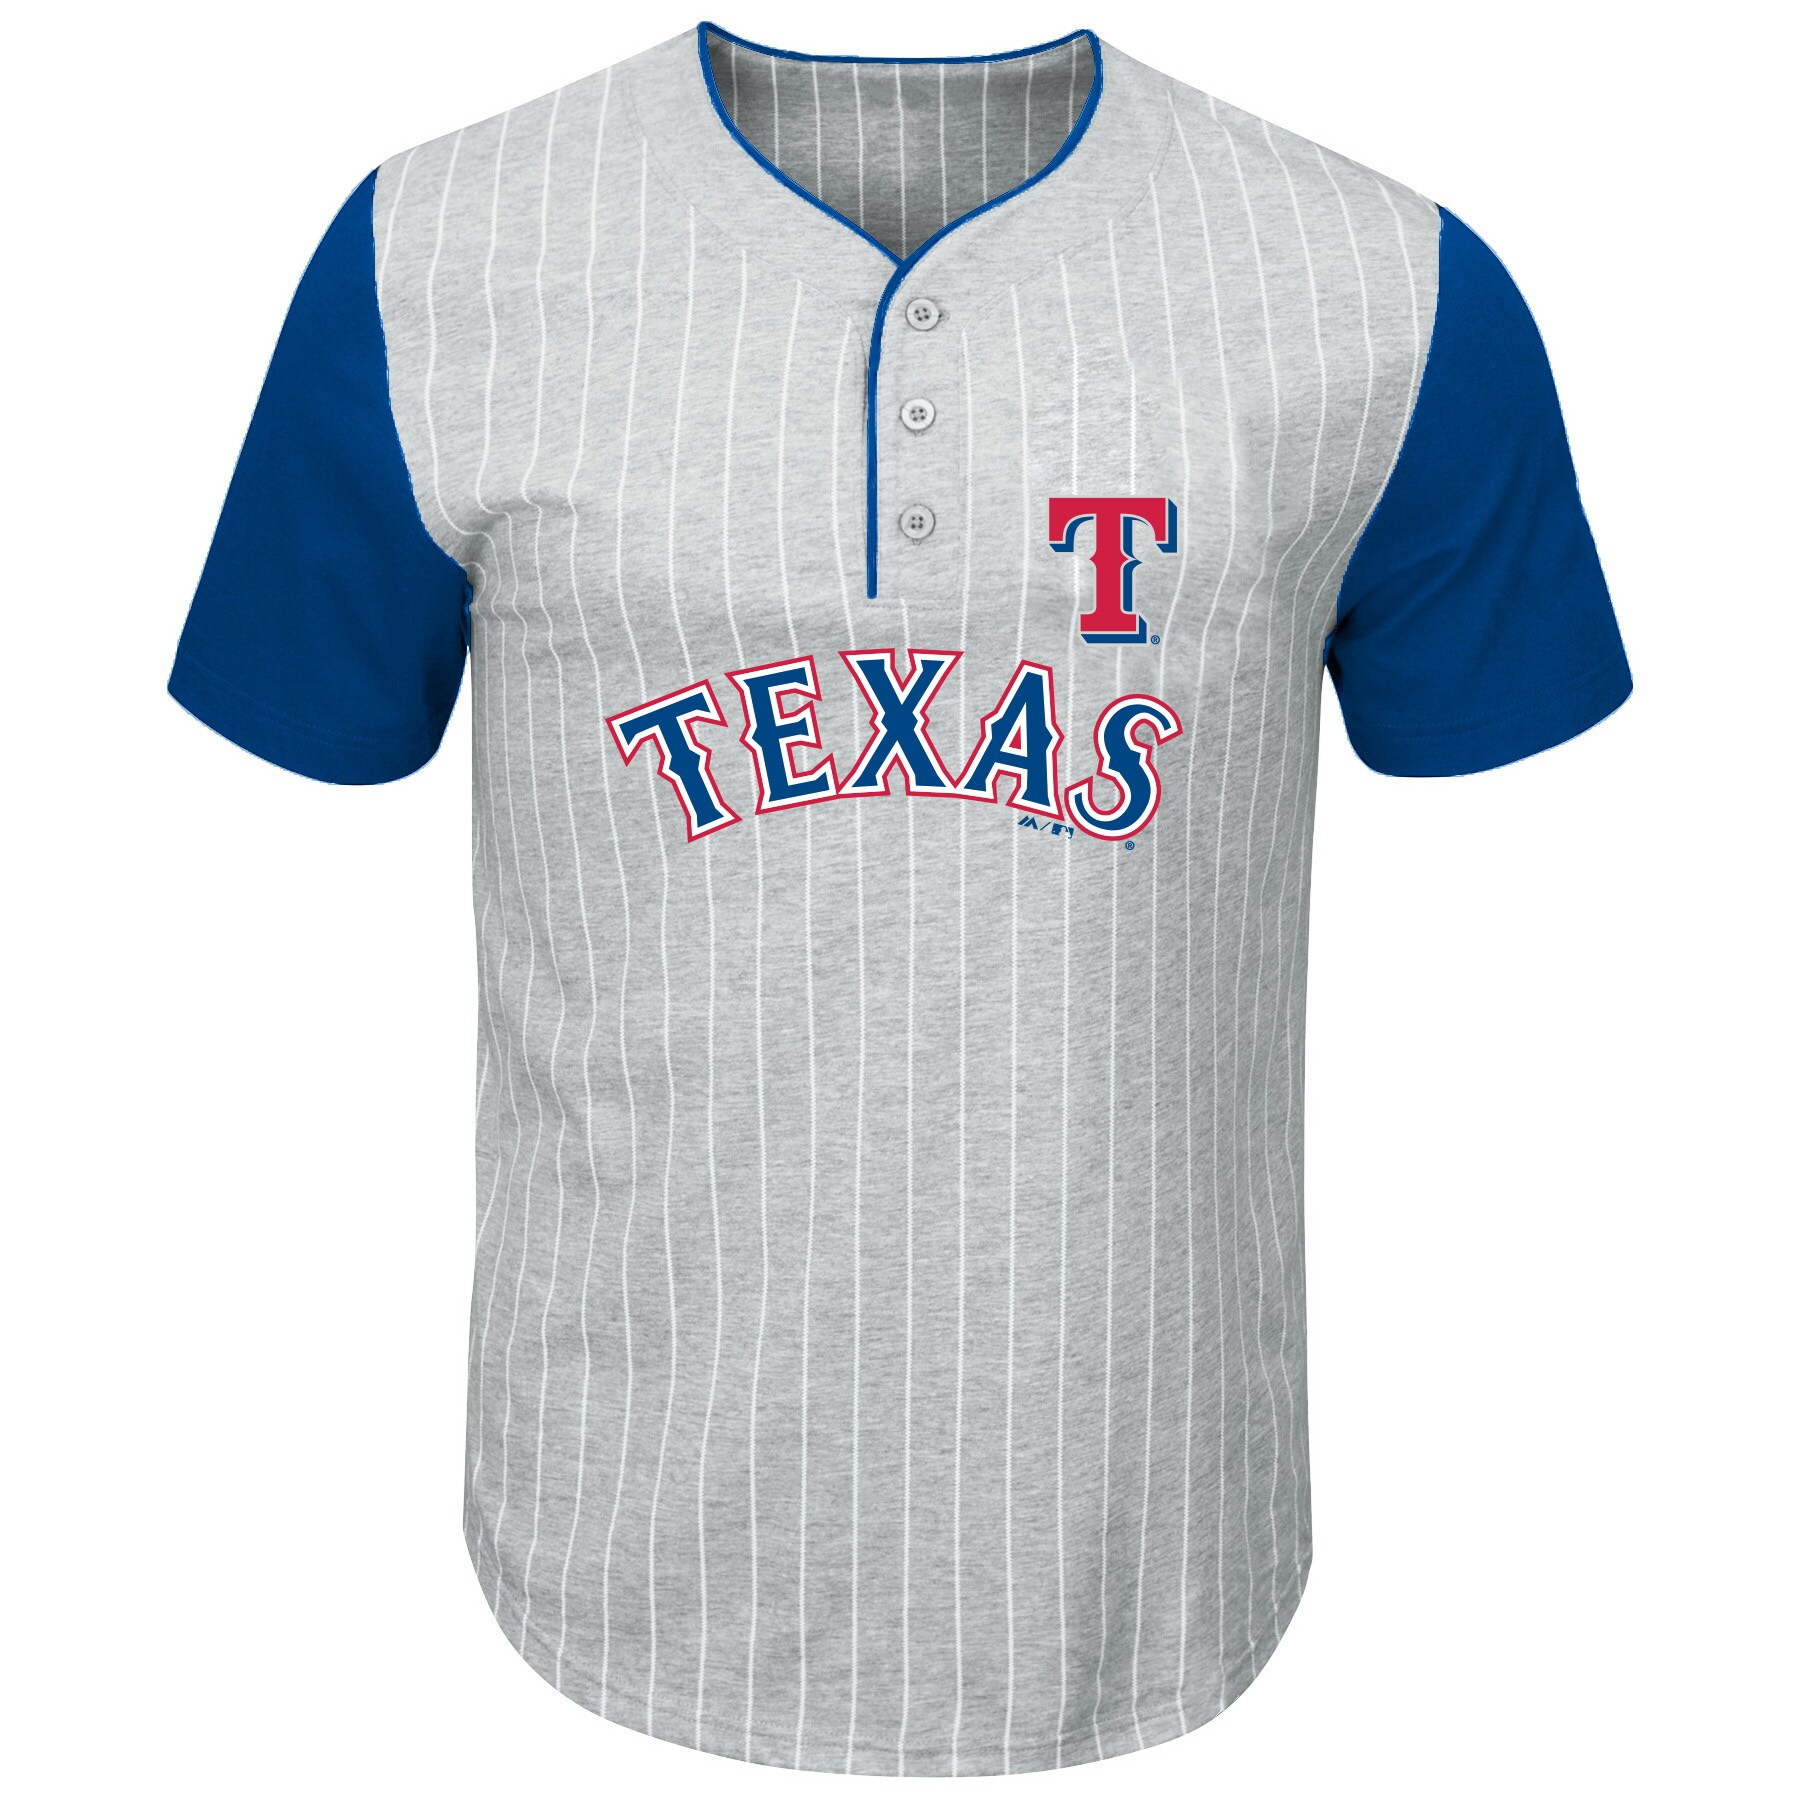 Texas Rangers Majestic Big & Tall Pinstripe Henley T-Shirt - Gray/Royal